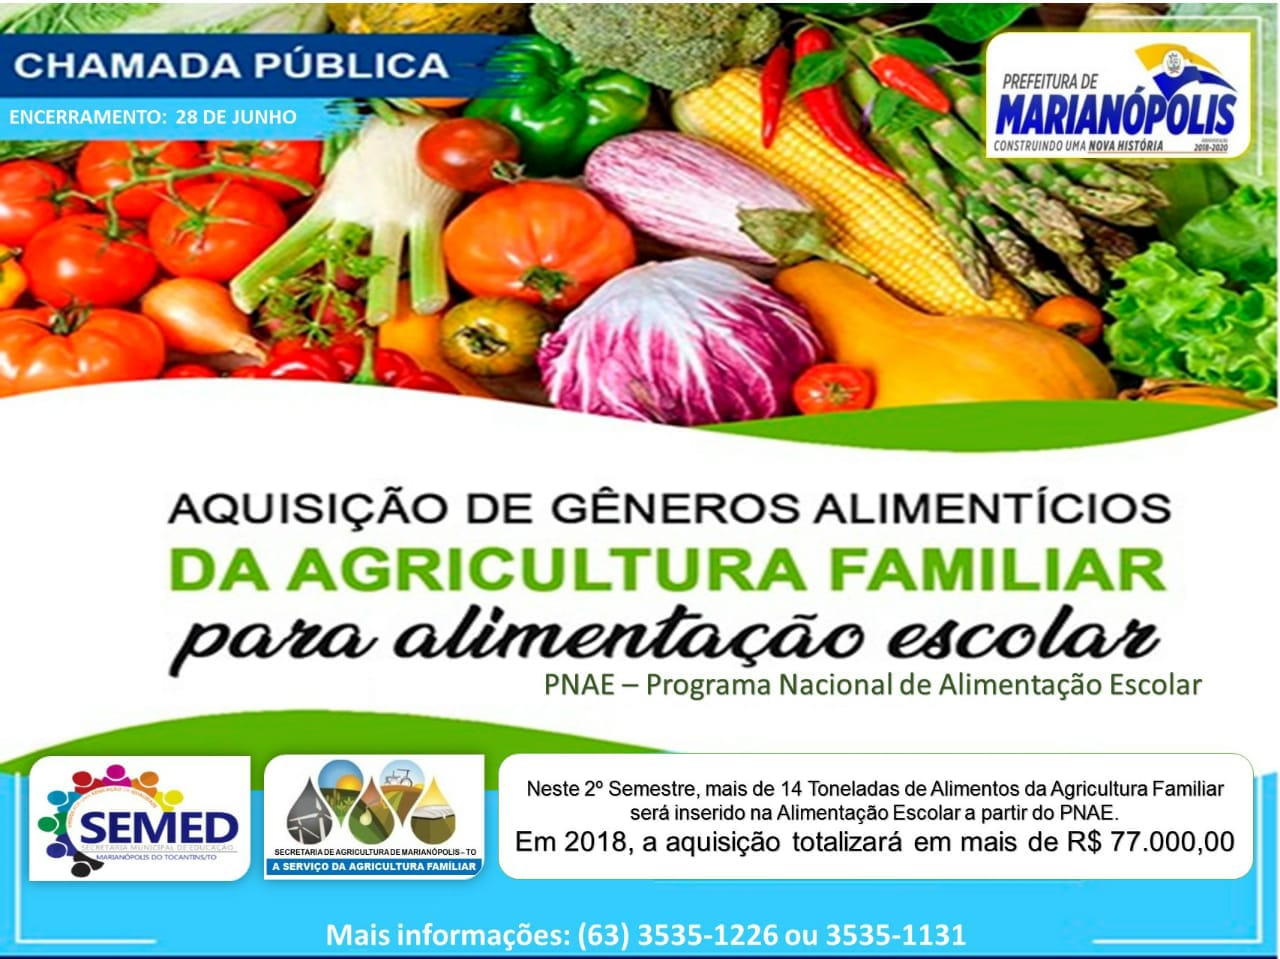 Prefeitura de Marianópolis abre Chamada Pública para compra de alimentos da Agricultura Familiar